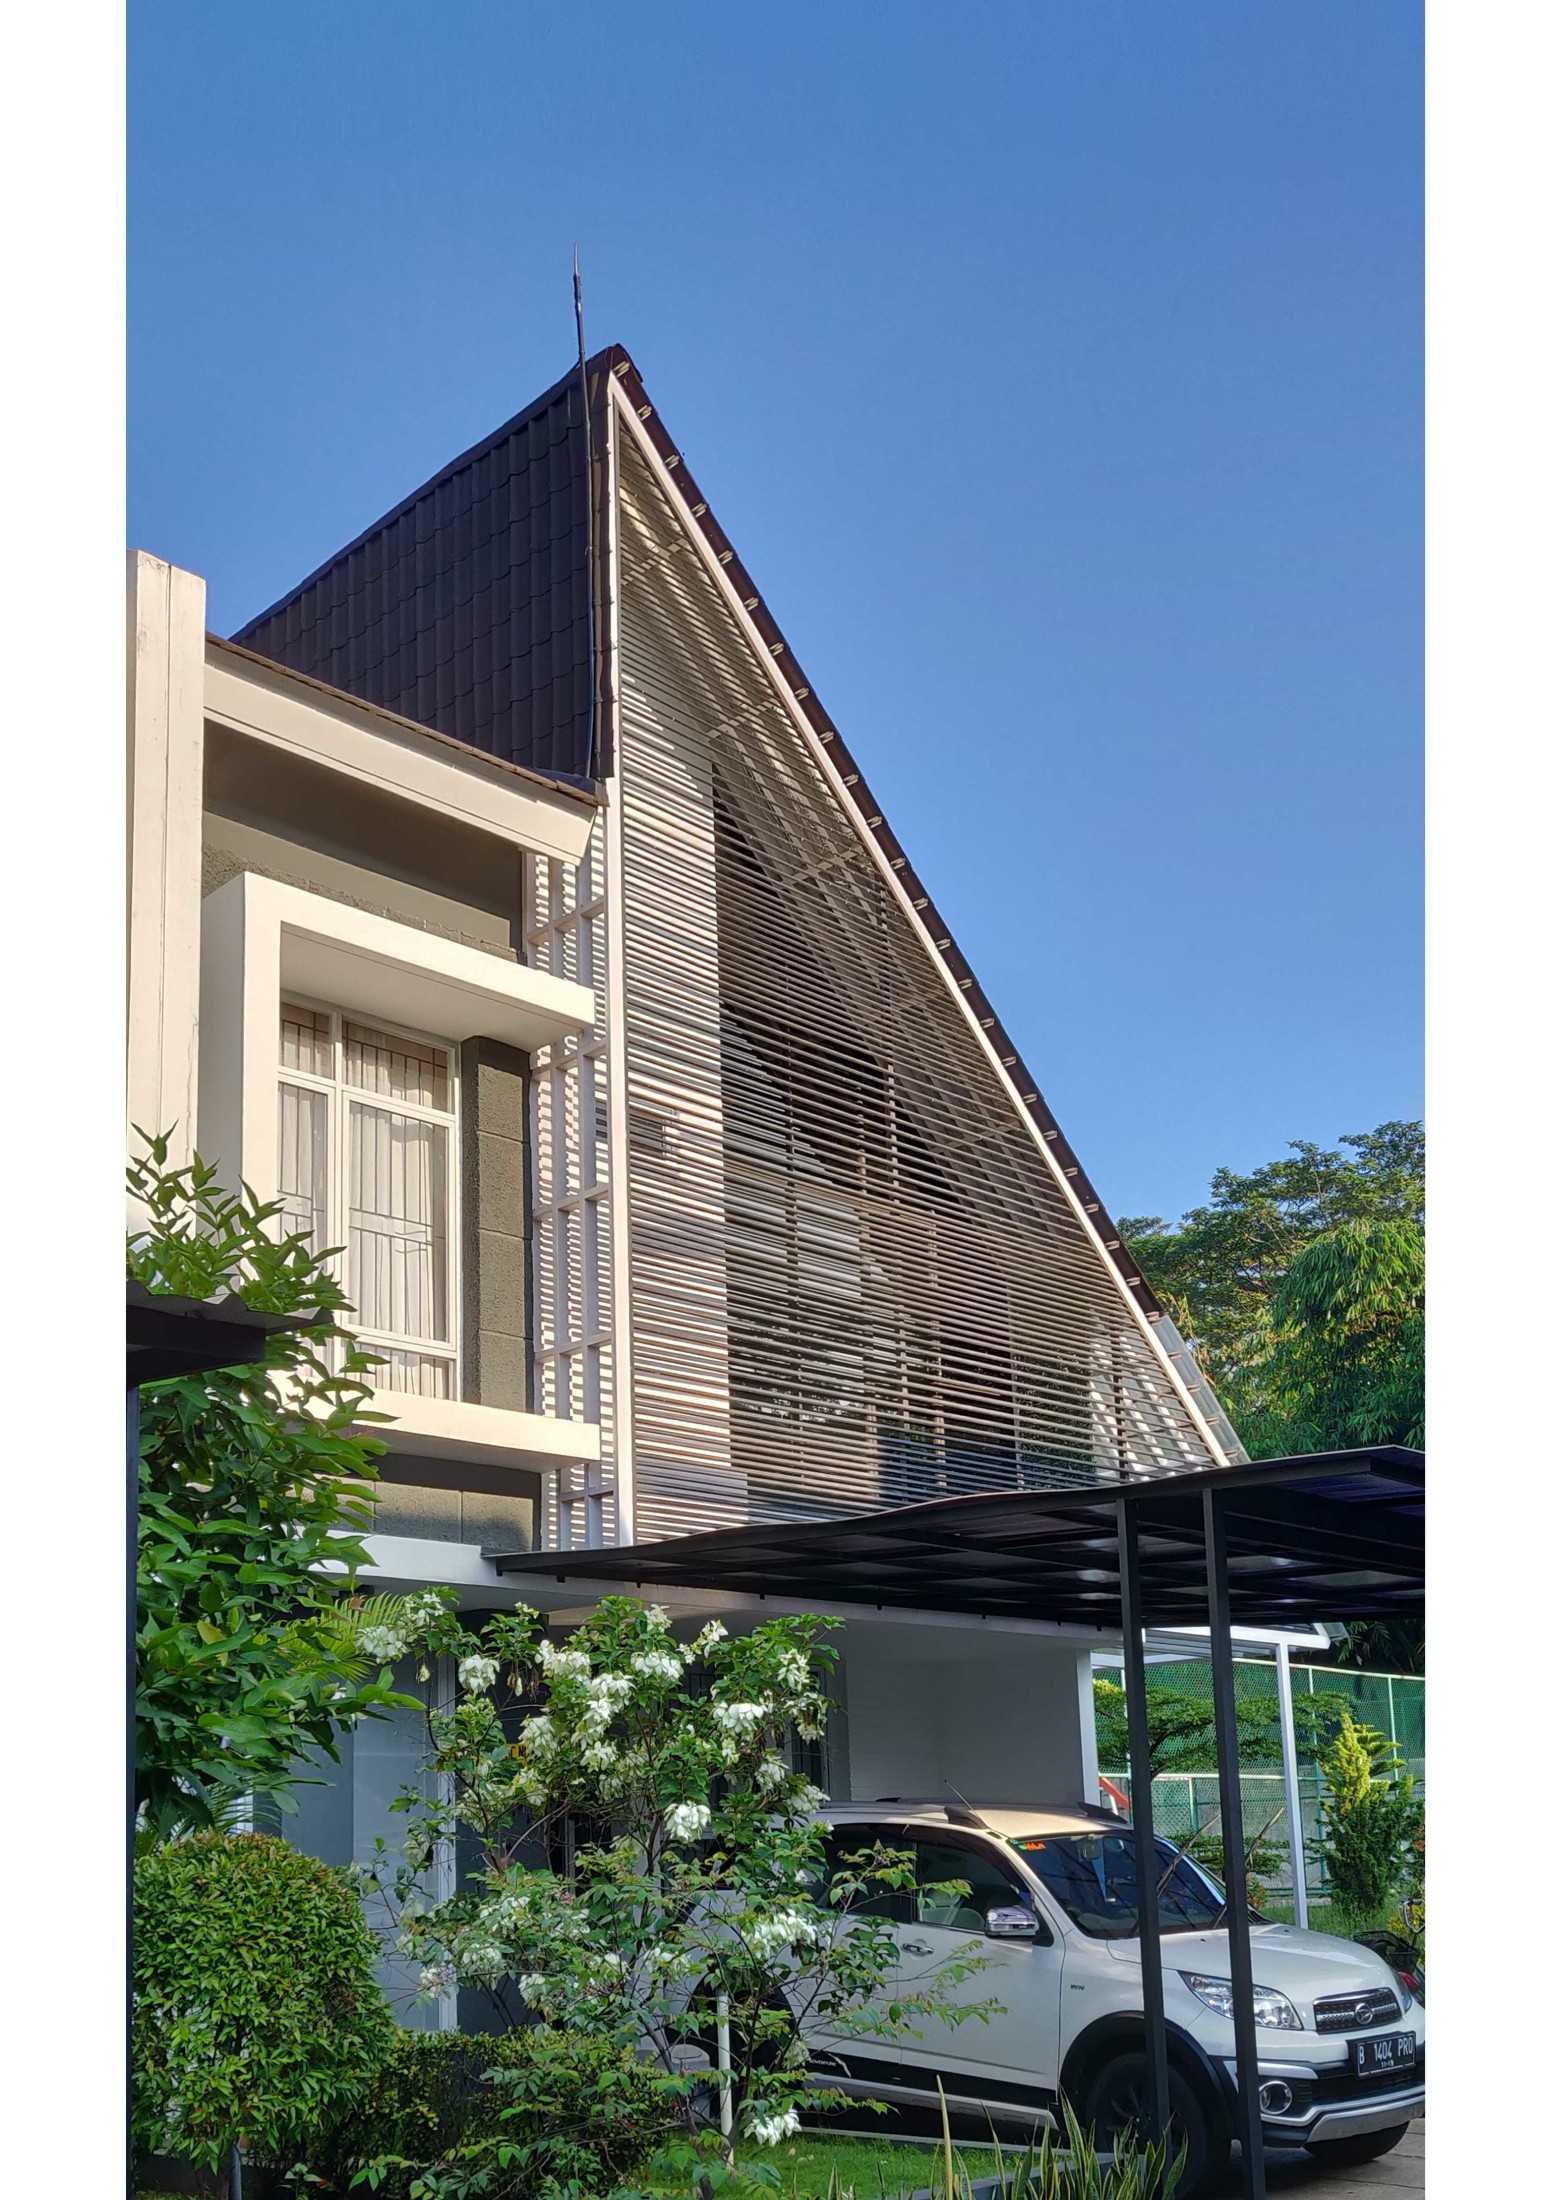 Arsitek Pramudya di Depok